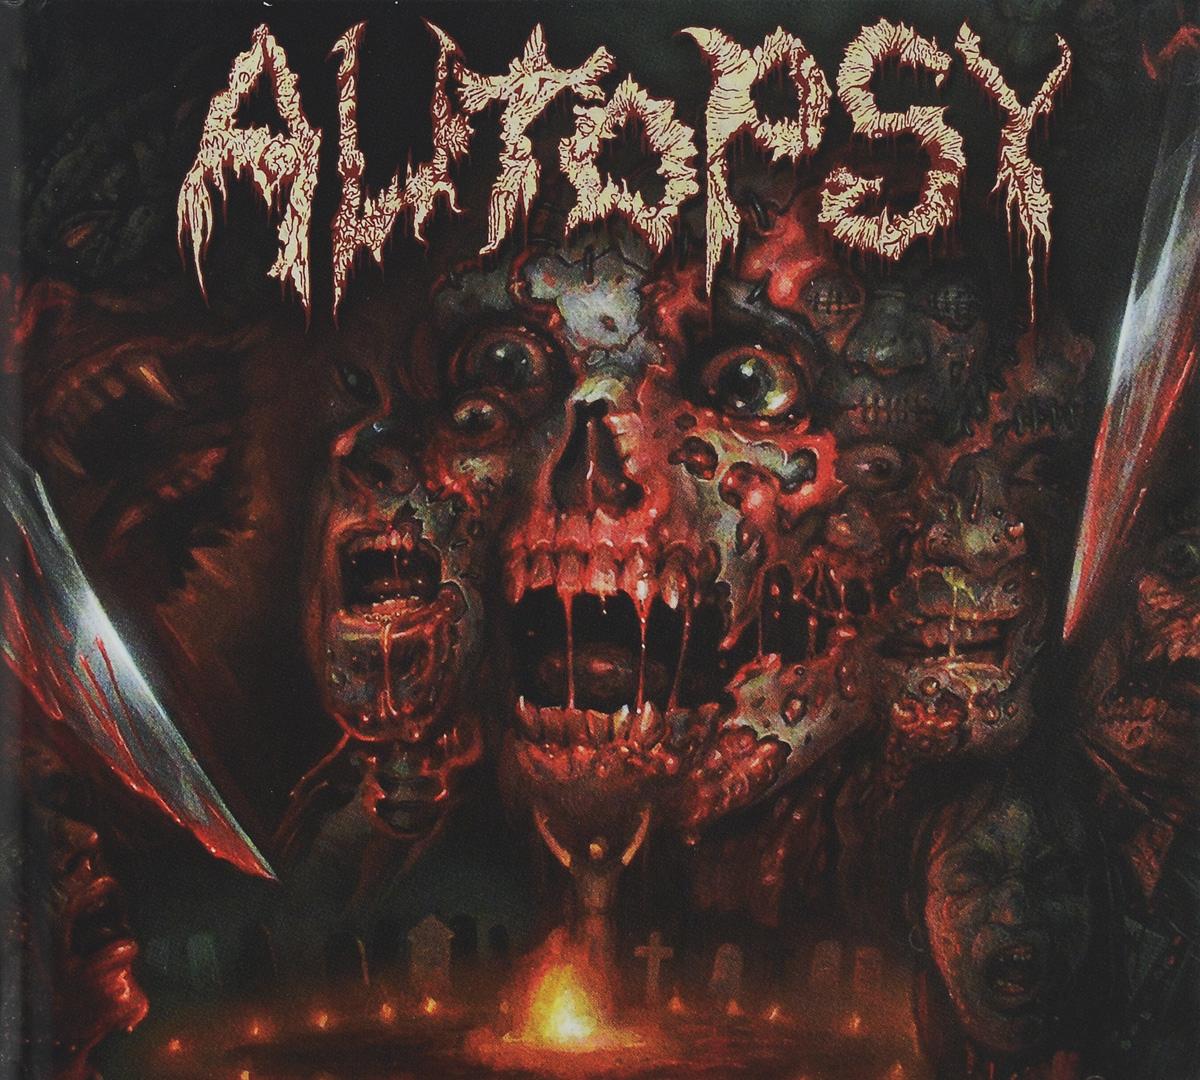 Autopsy Autopsy. The Headless Ritual ritual lighting